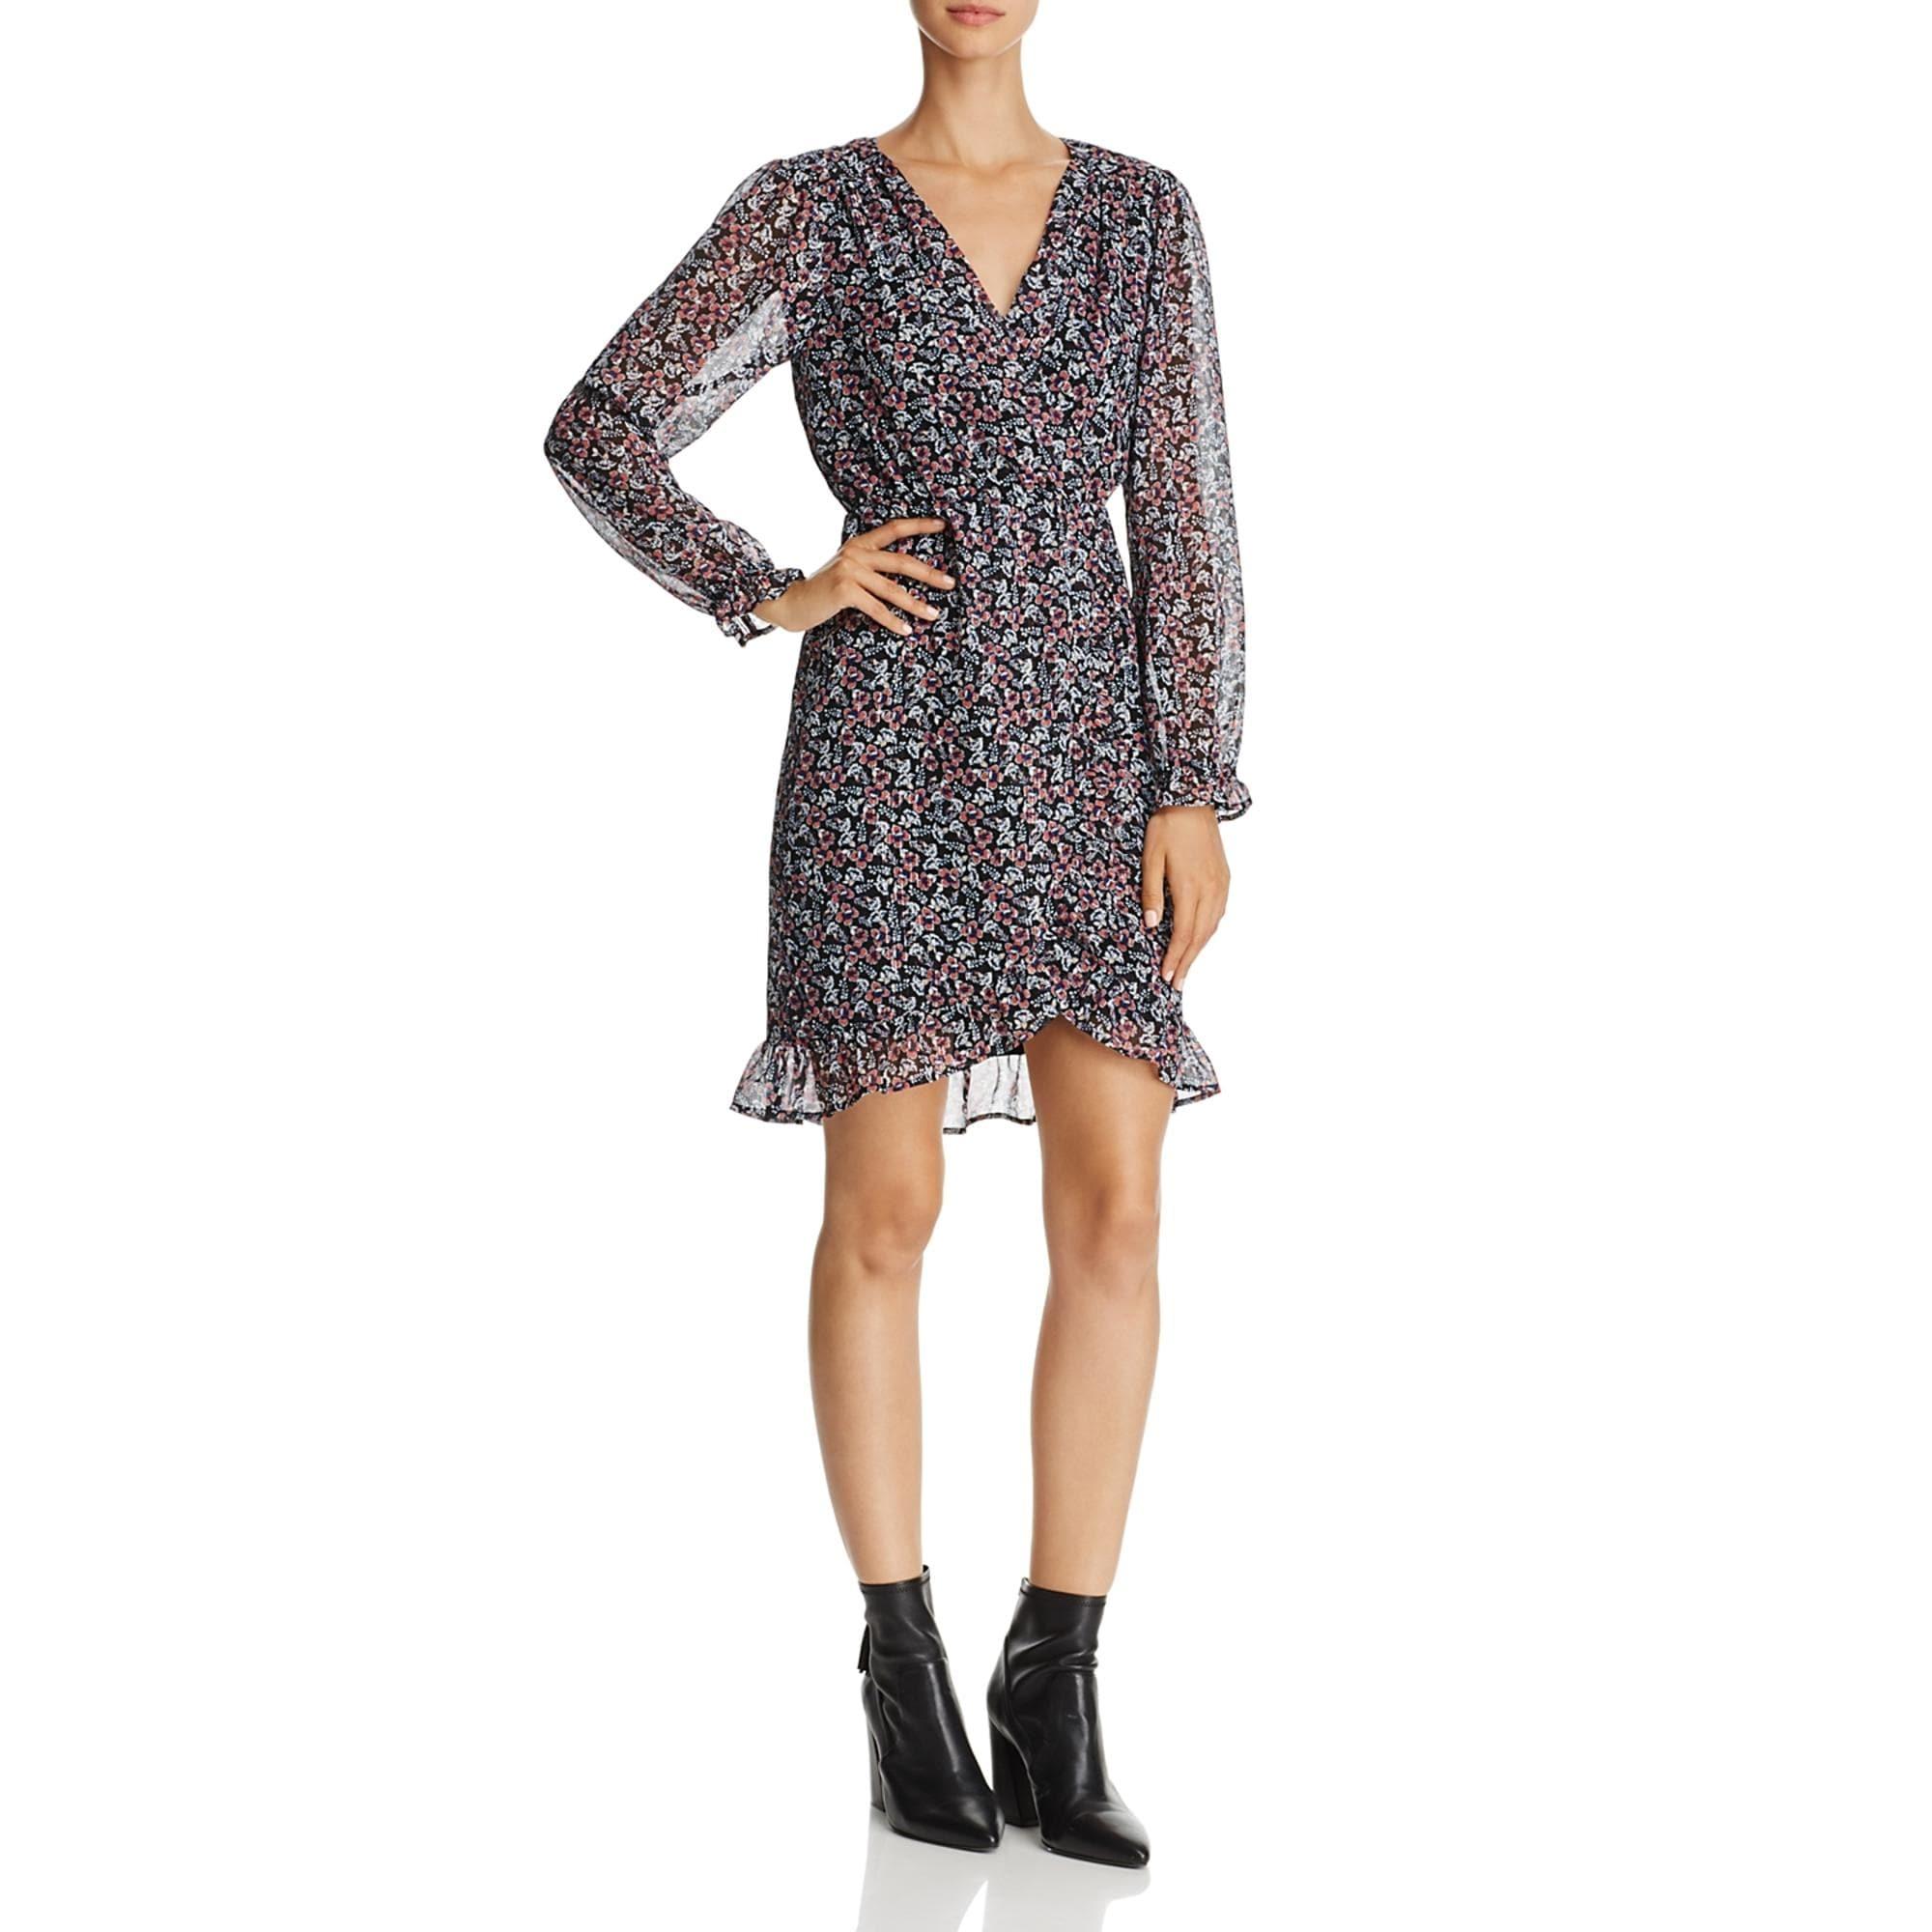 Beltaine Women/'s Chiffon Floral Print Flounced Surplice Day Dress